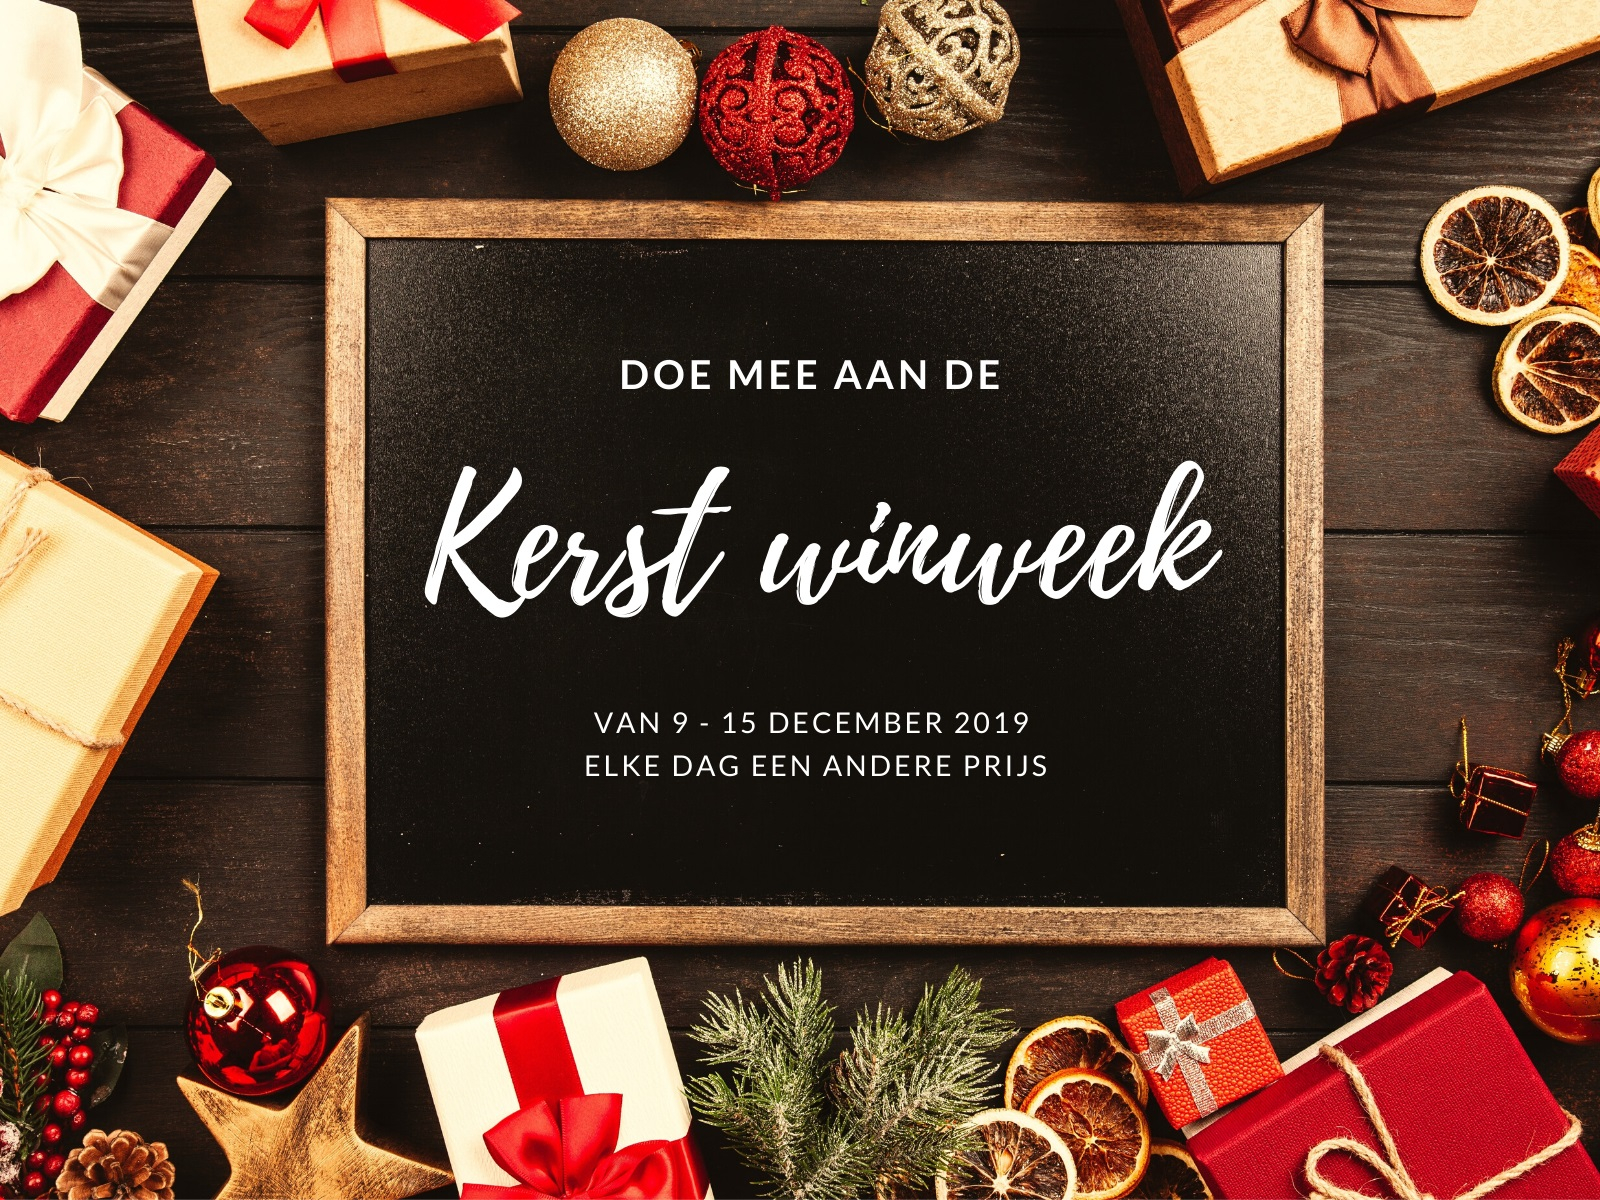 Kerst winweek 2019